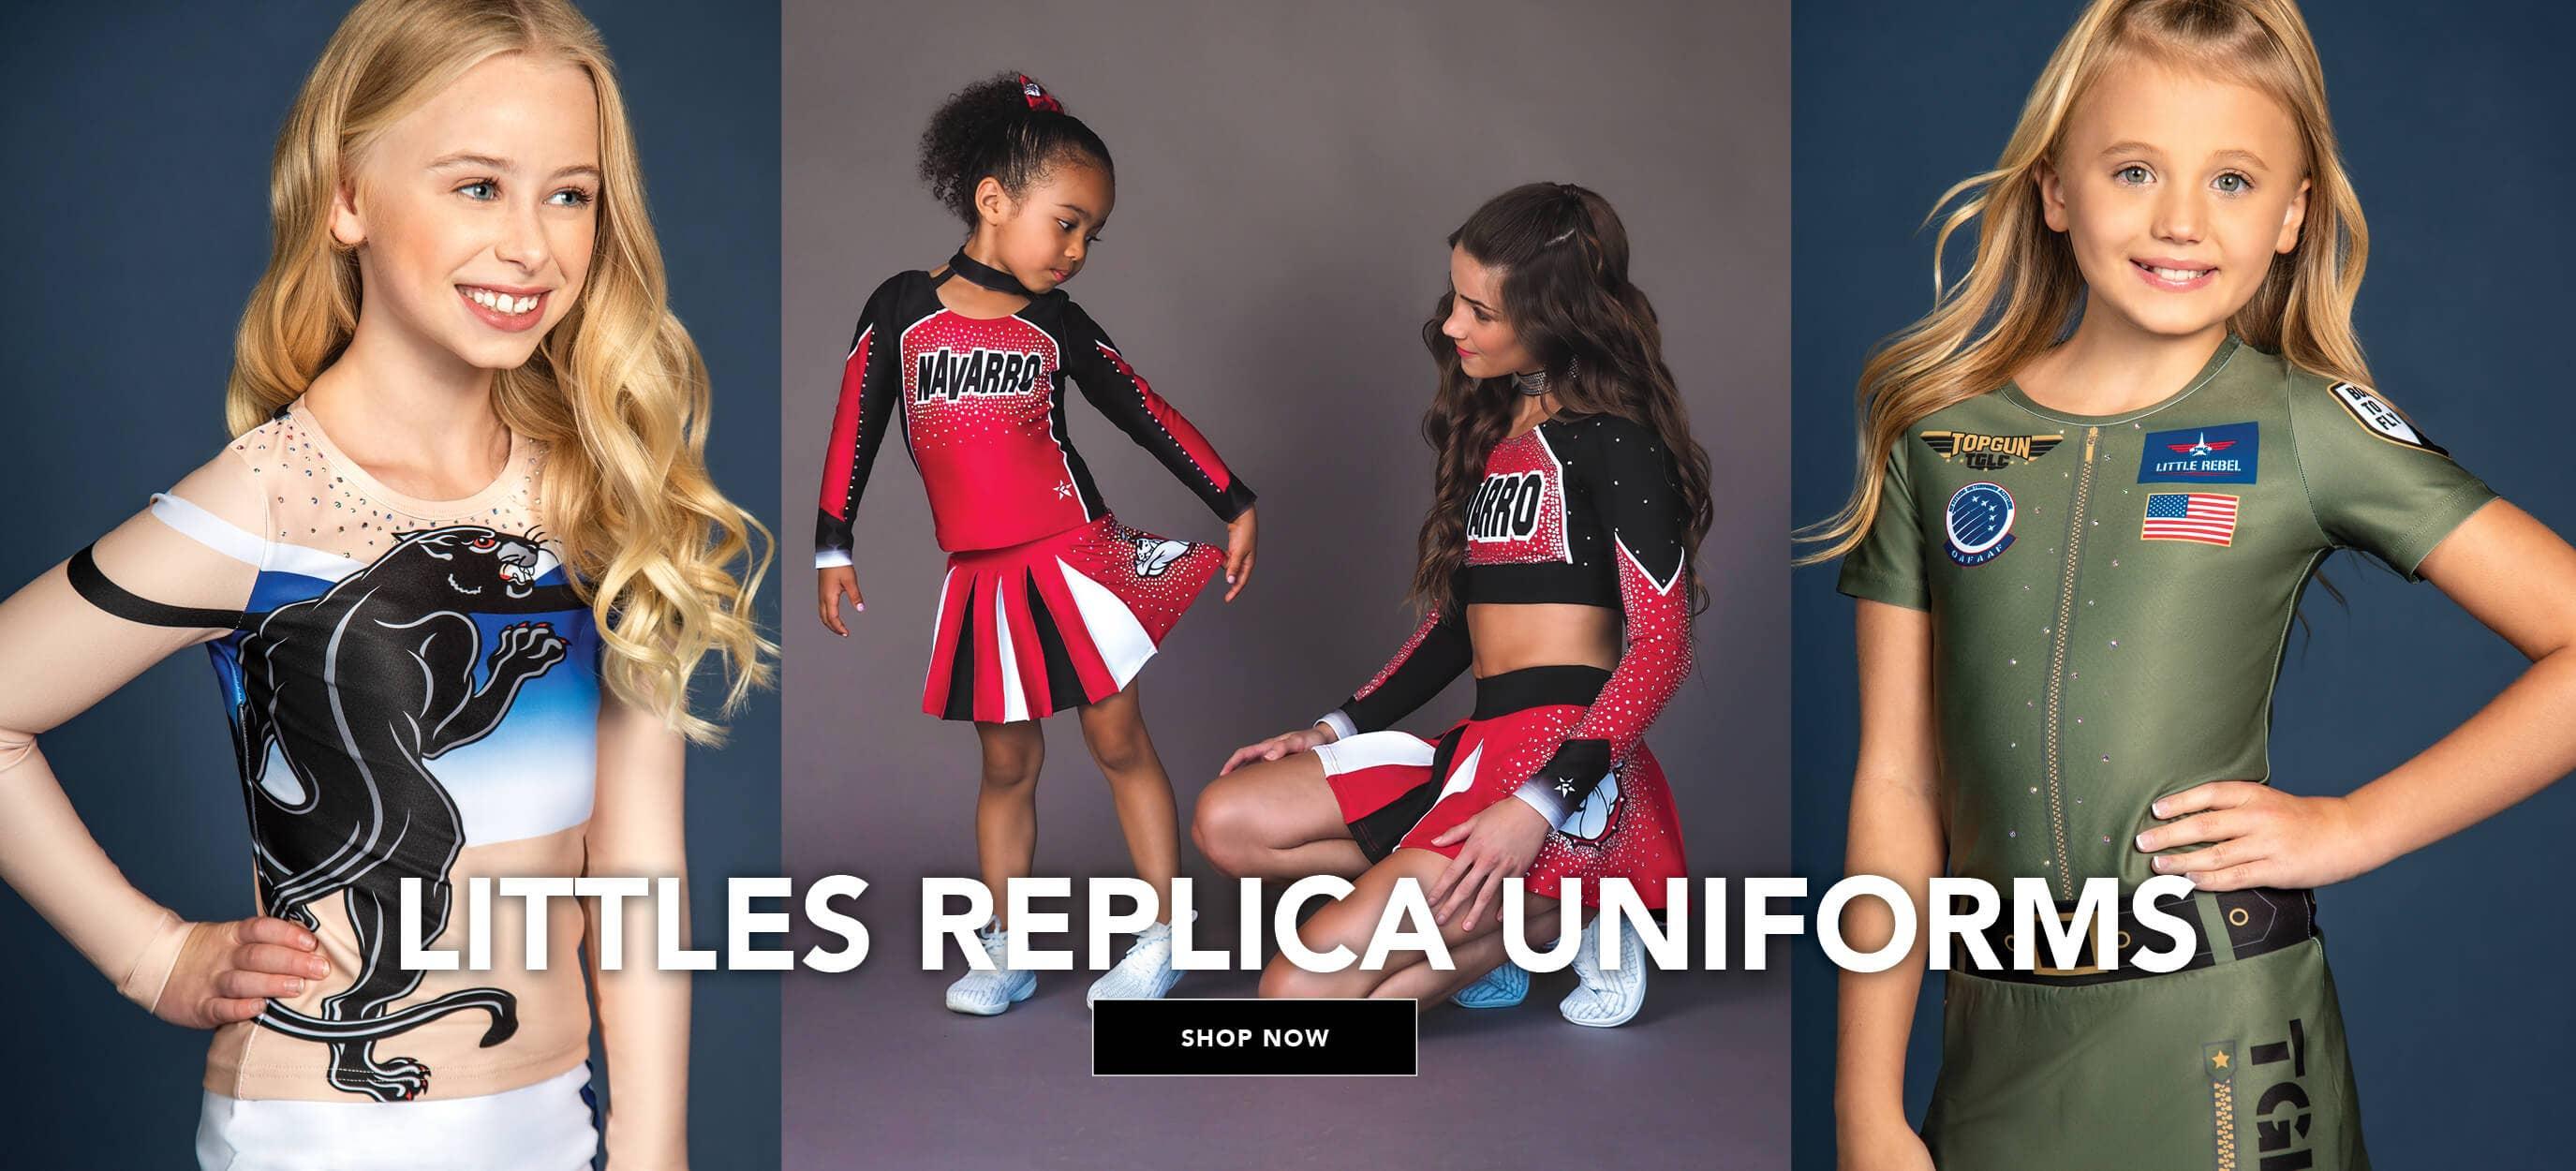 cheer athletics littles replica uniforms